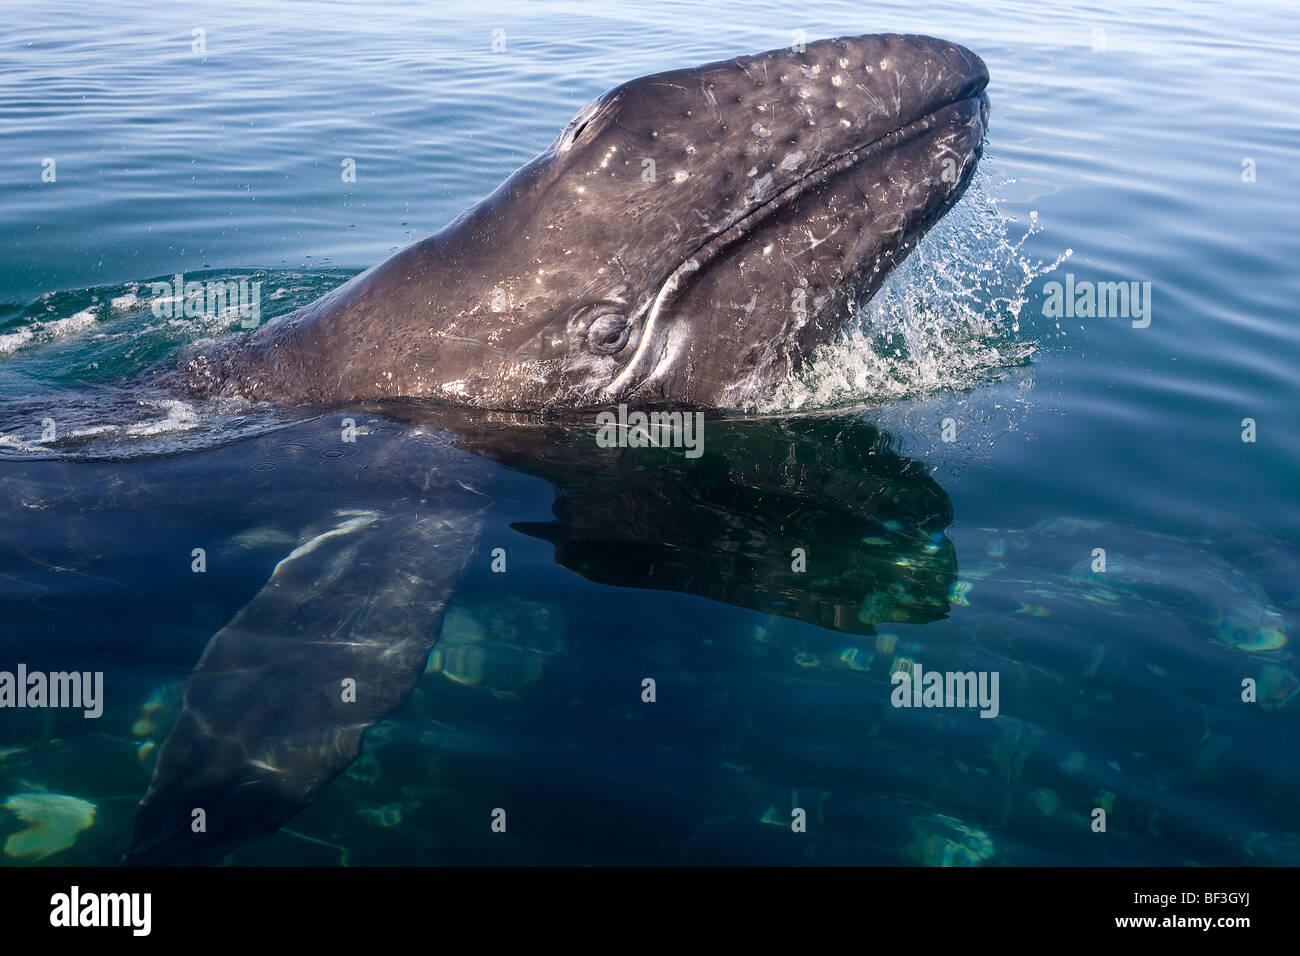 Balena Grigia, balena grigia (Eschrichtius robustus, Eschrichtius gibbosus). Vitello con la testa sollevata al di Immagini Stock